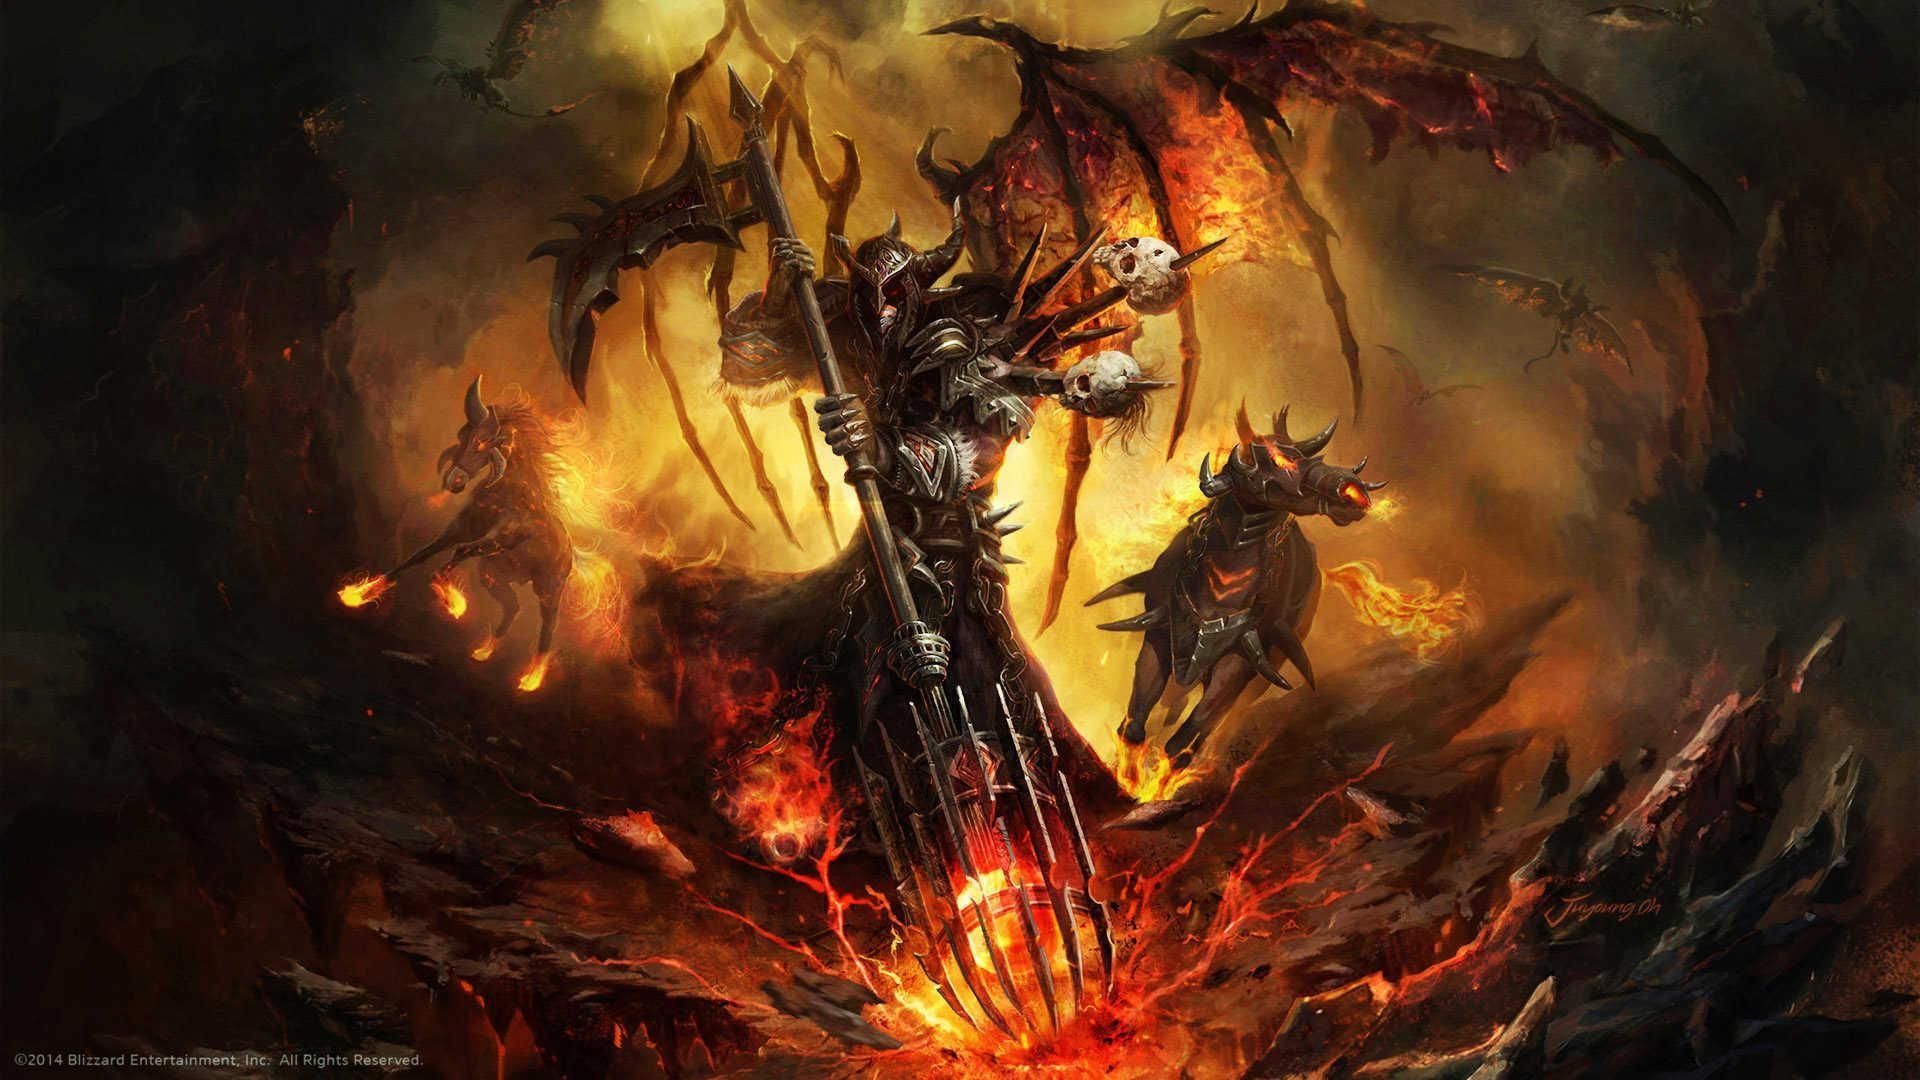 warlock-wallpaper-wpc90010468